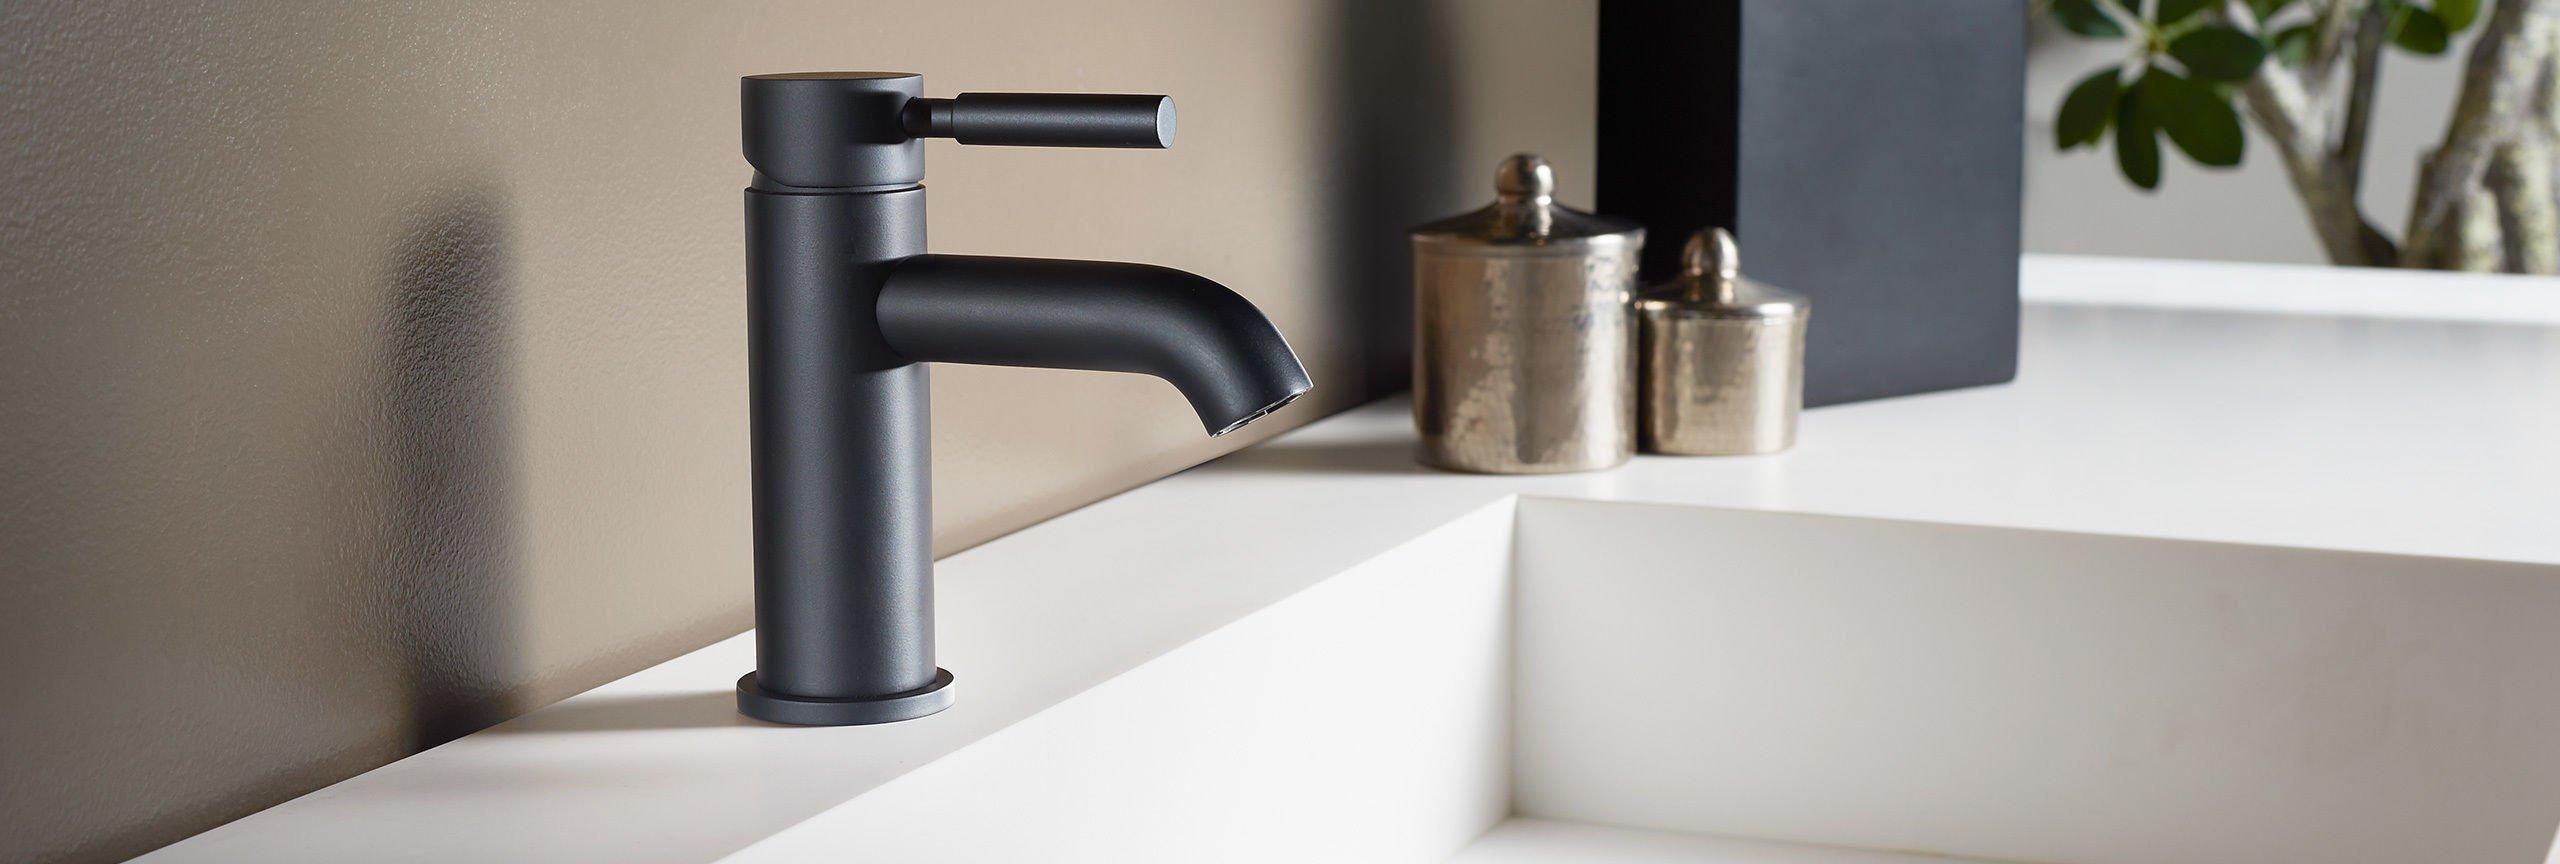 bathroom series Avalon single hole faucet in matte black